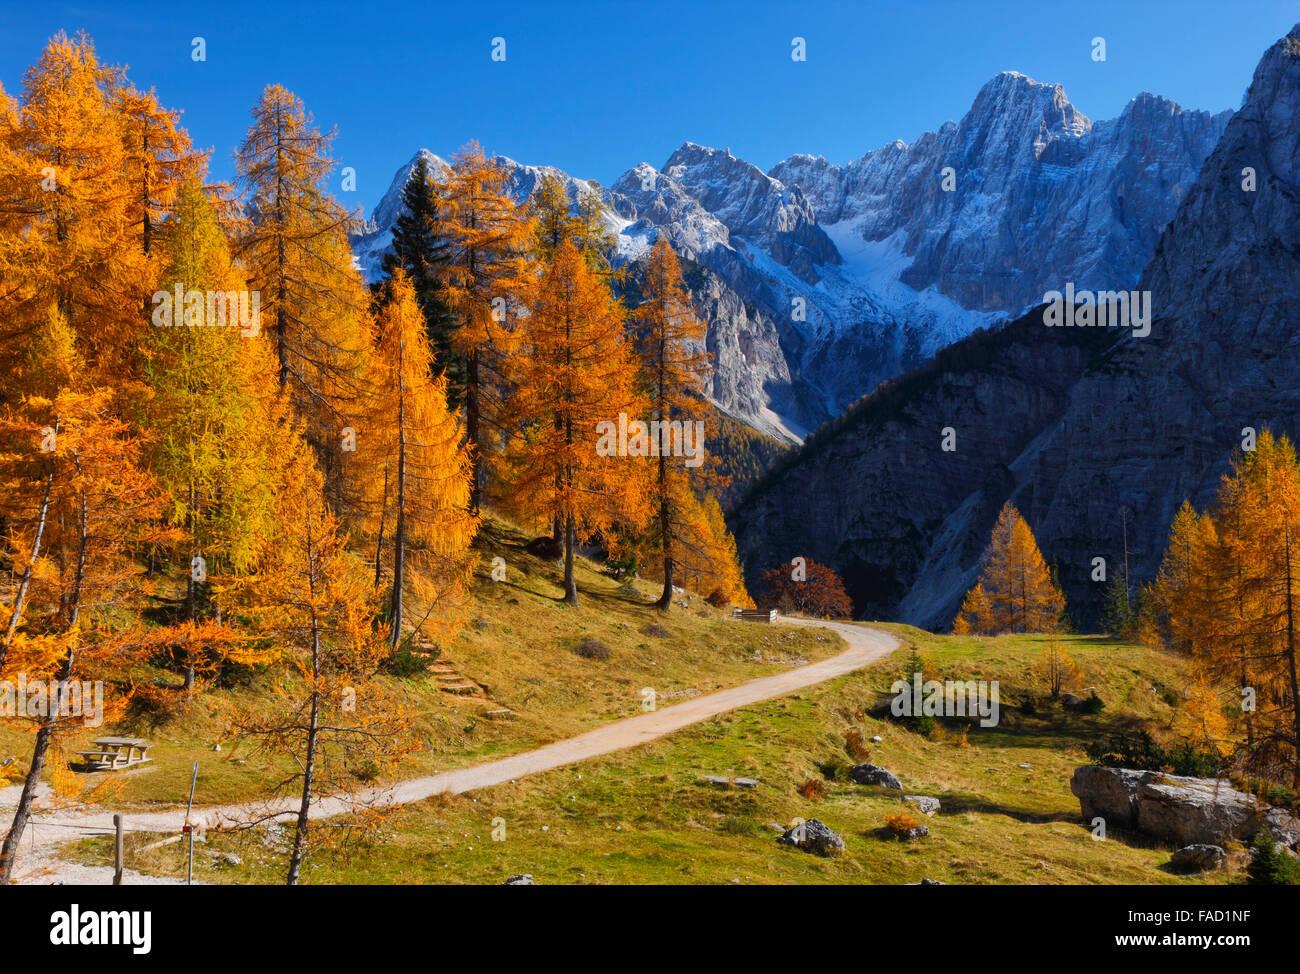 Bunte Kiefern im Herbst. Julischen Alpen in Slowenien Stockbild